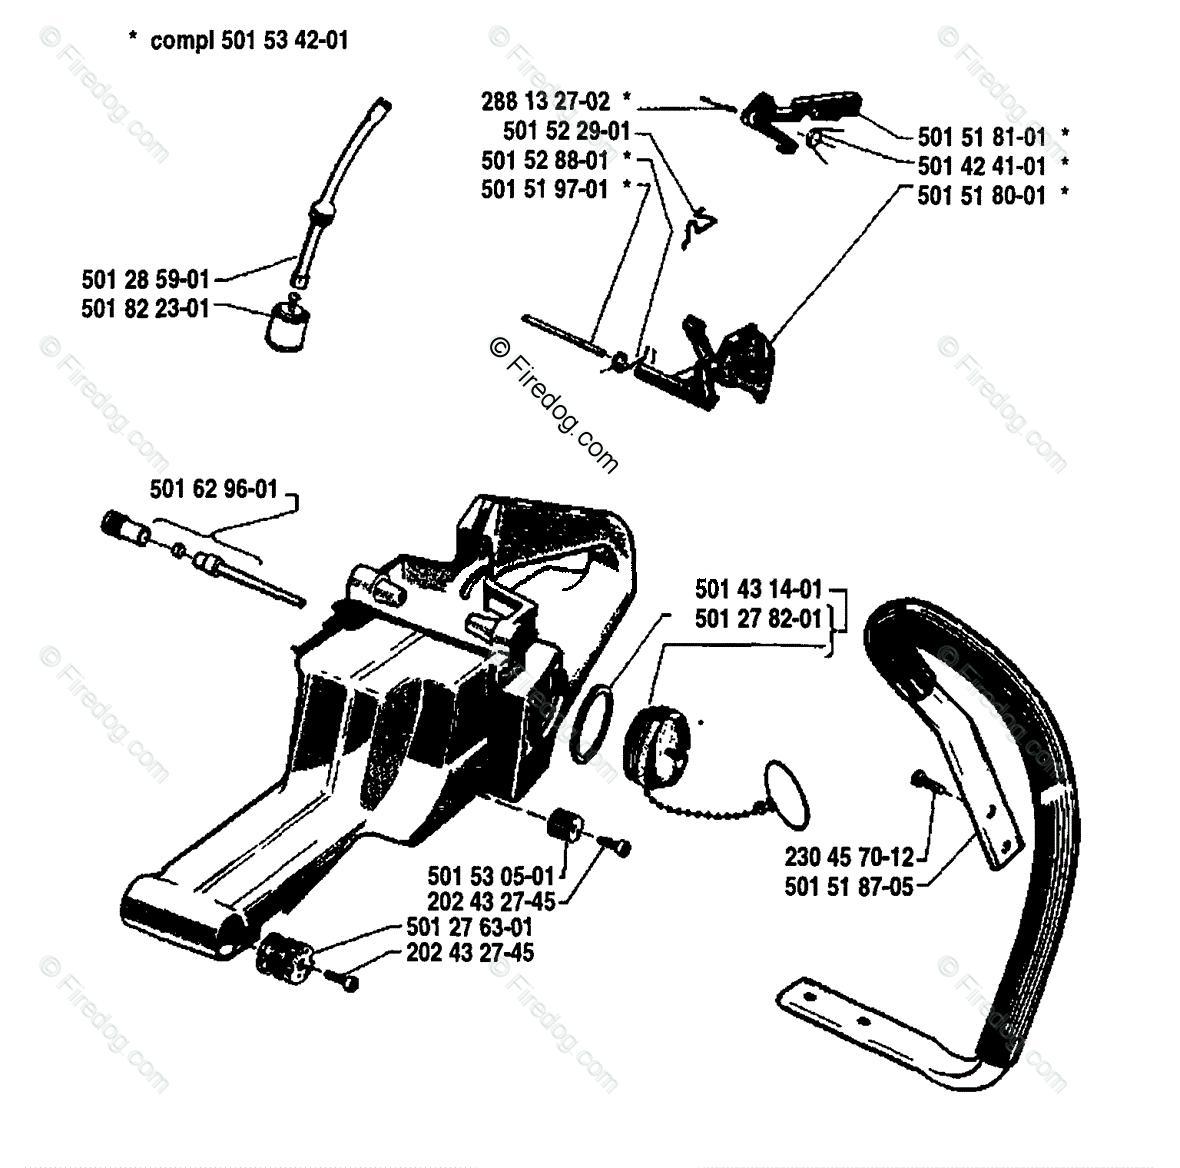 Husqvarna 350 Chainsaw 2004 Parts Diagram Page 9